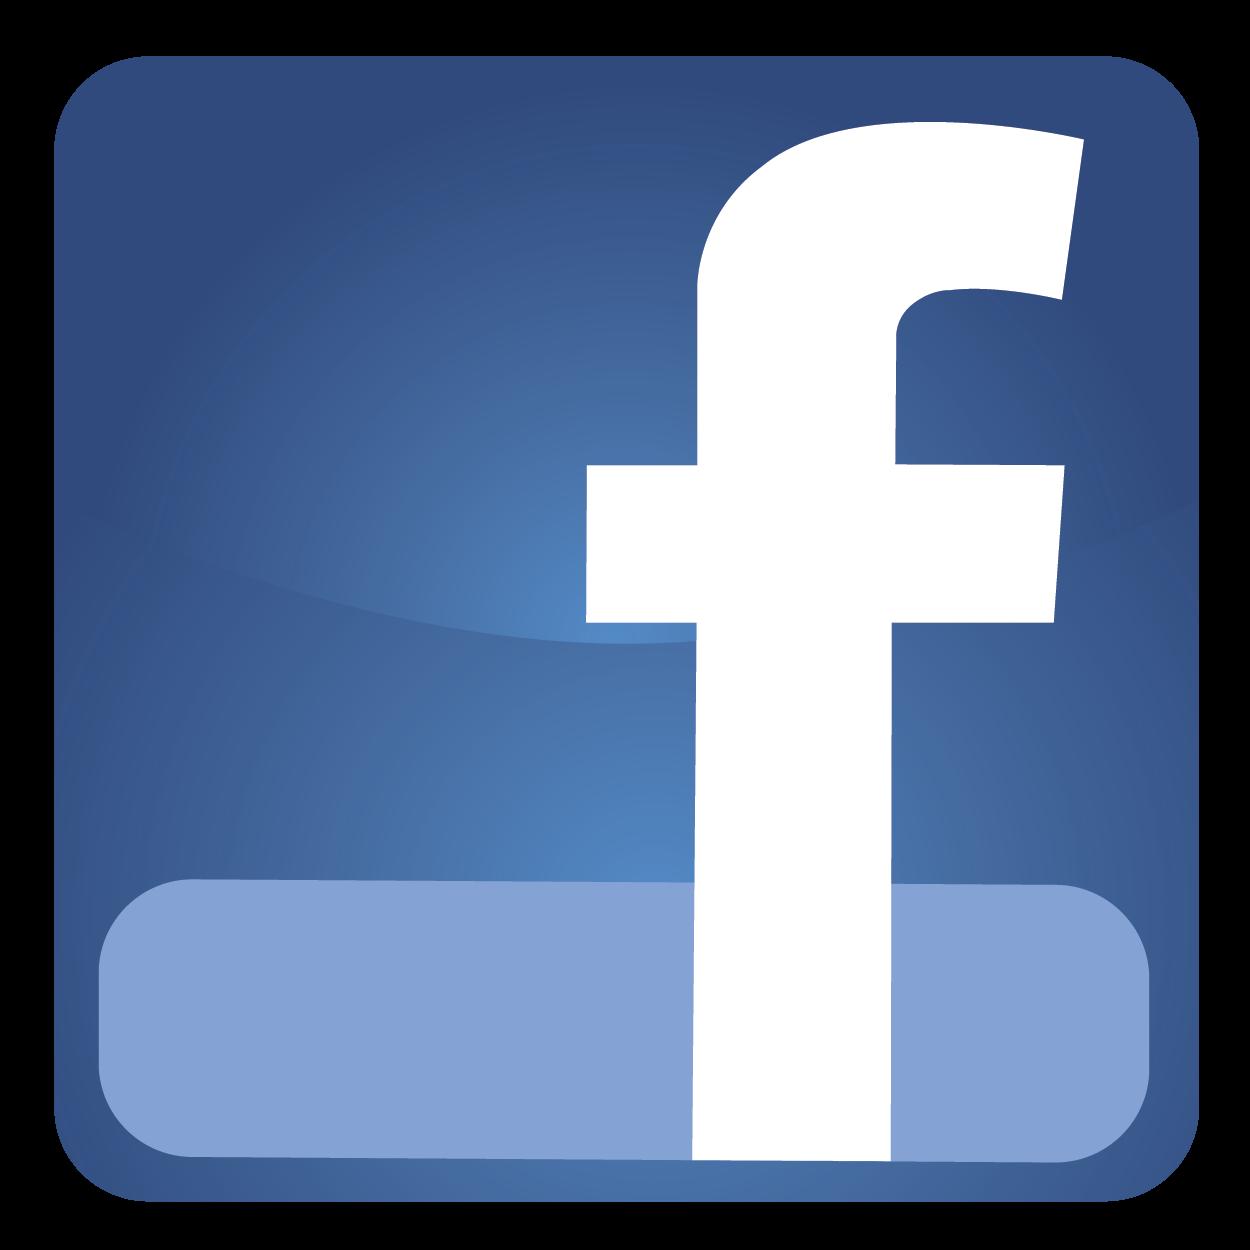 Fb Logos